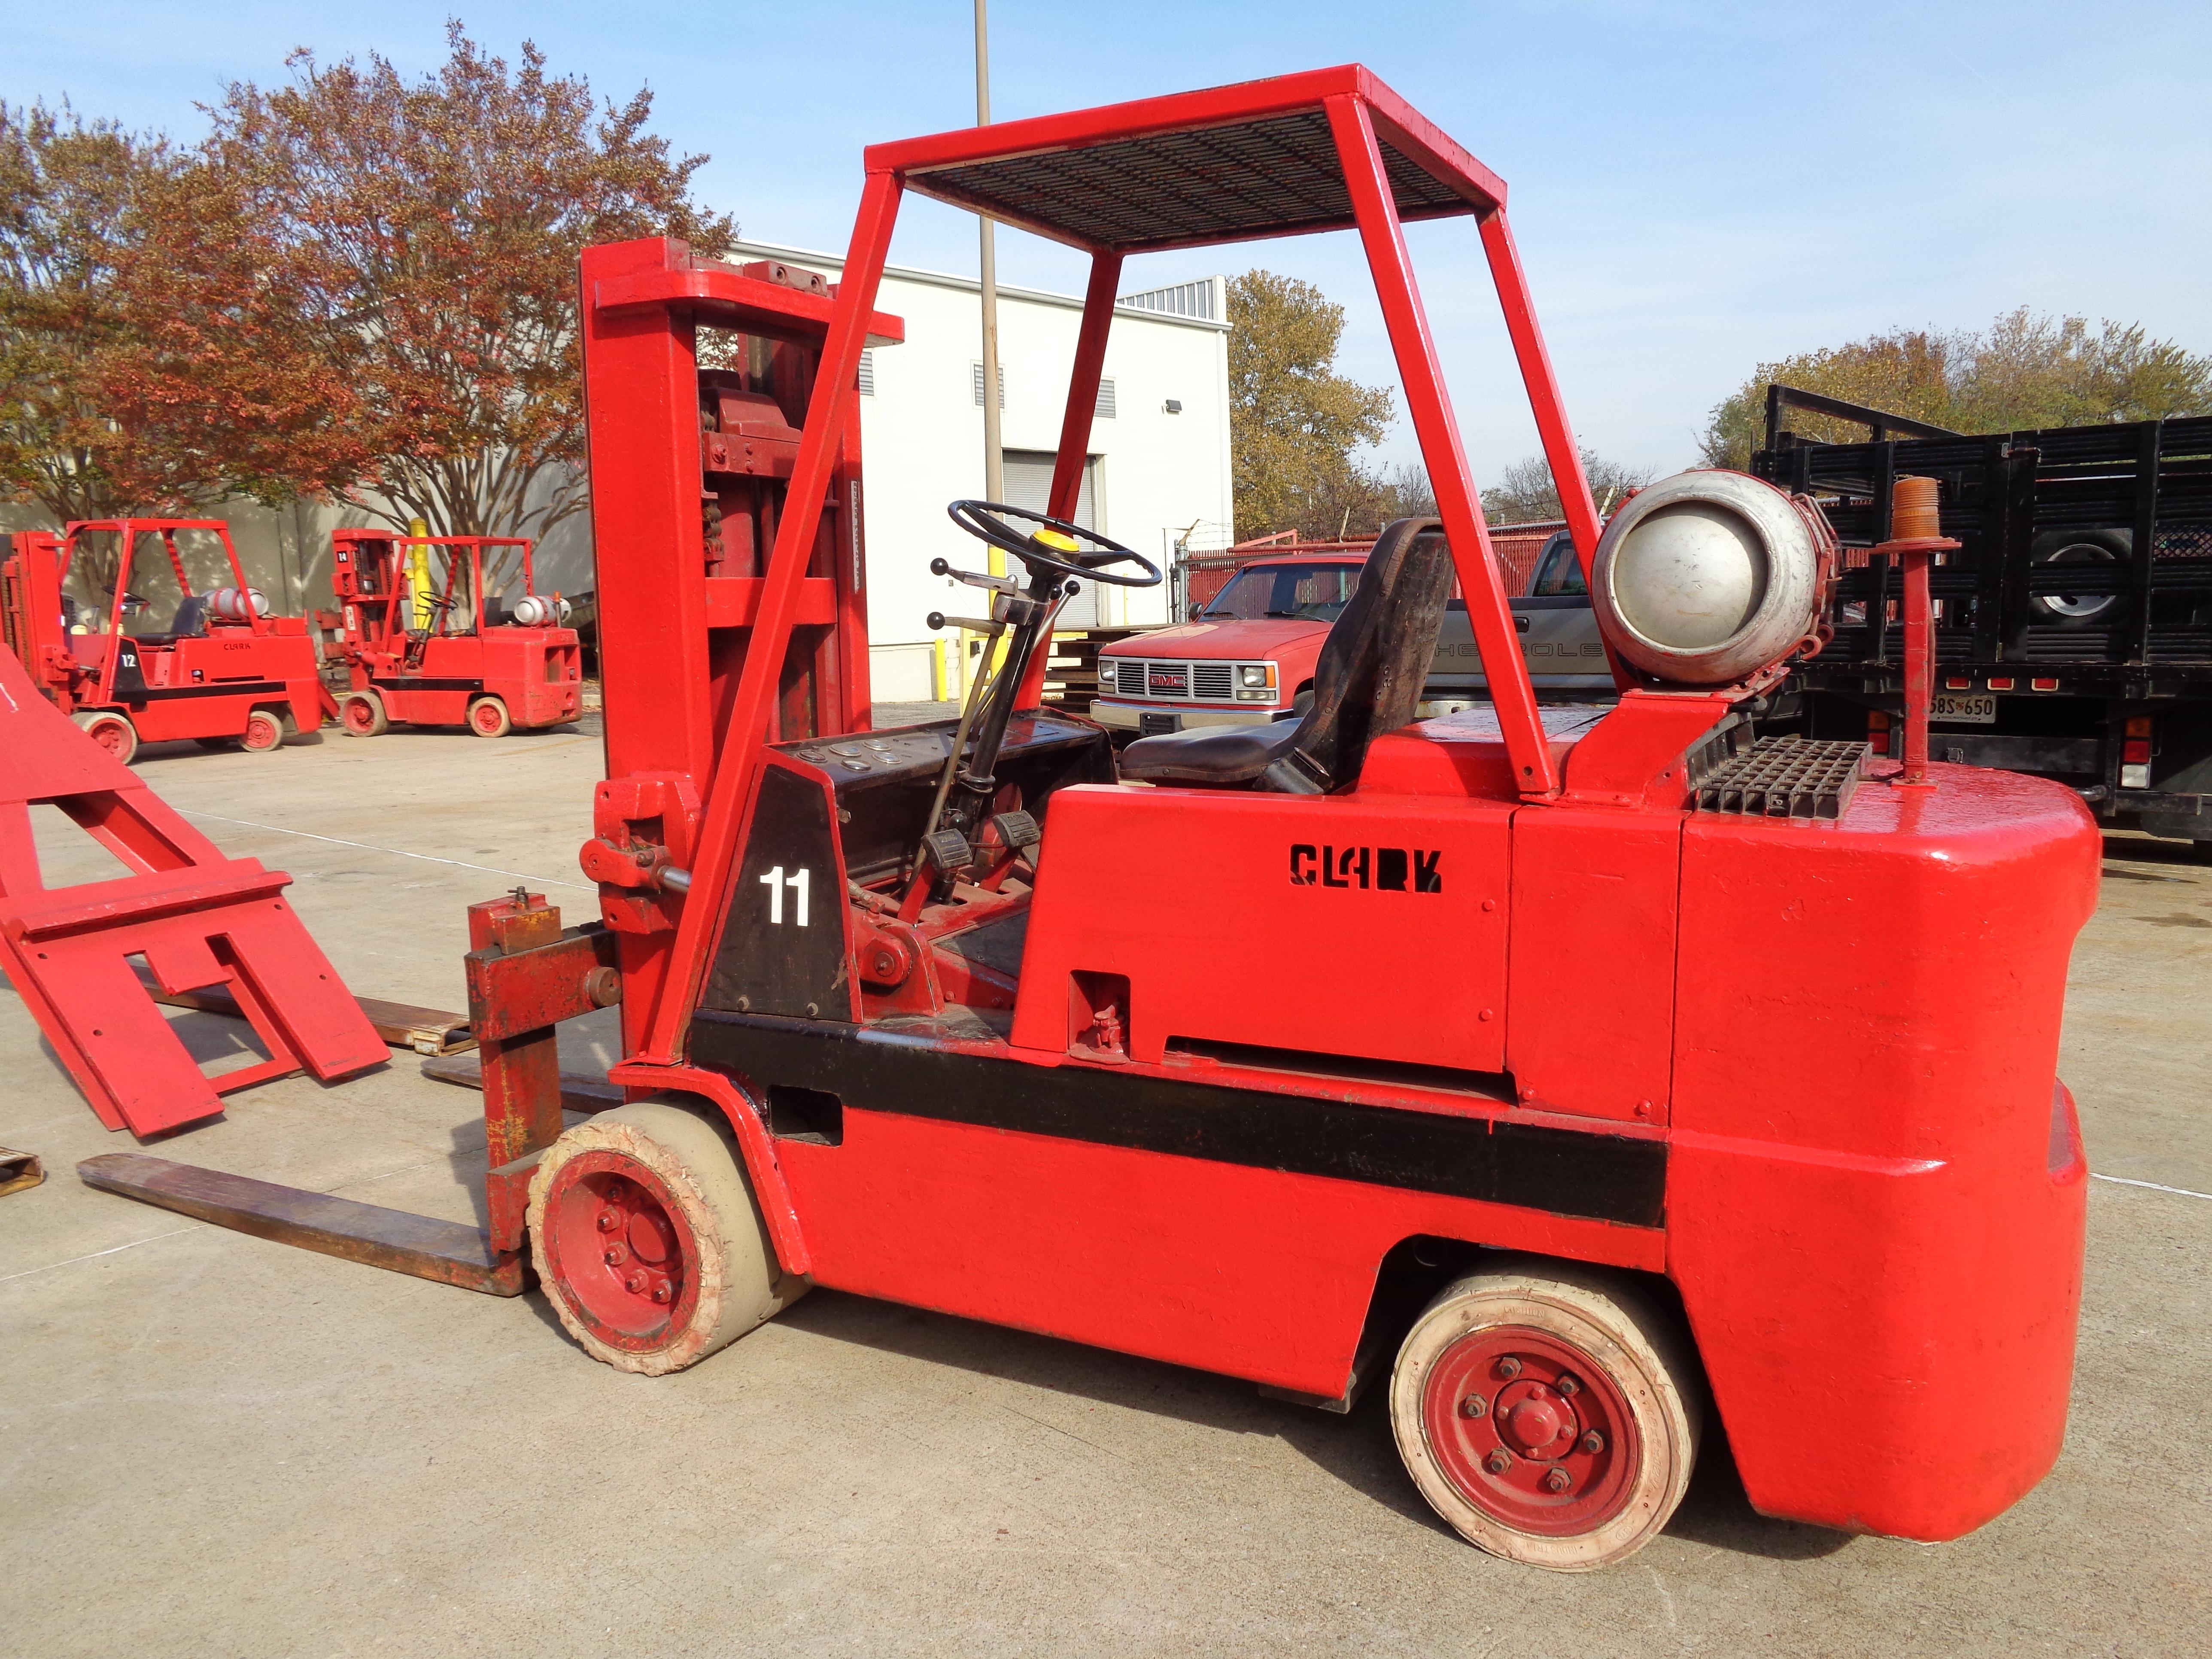 Clark C500-120 Forklift plus boom - 12,000 lbs - Image 3 of 11